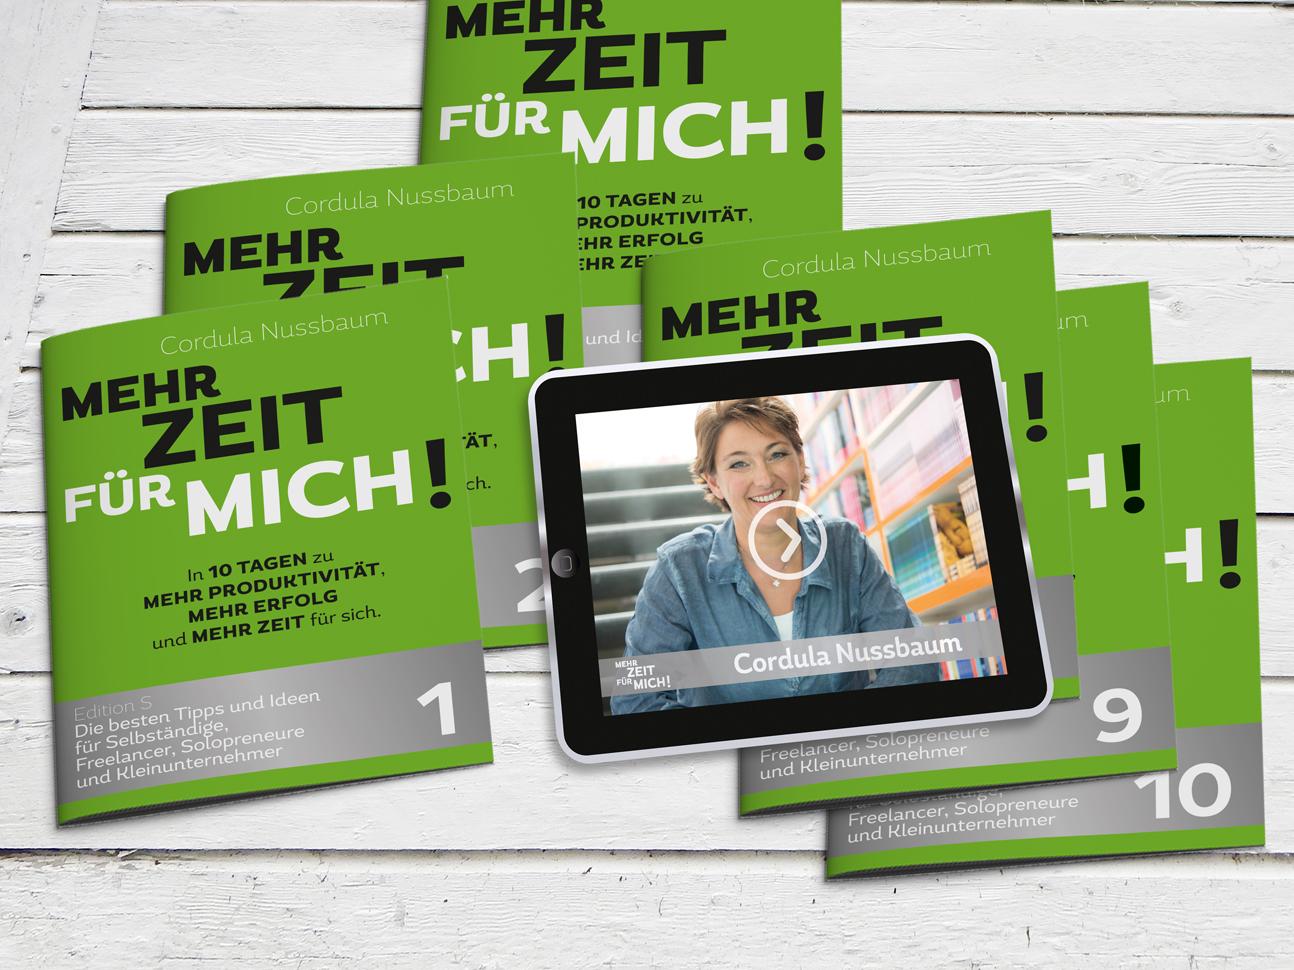 martin_zech_design_corporate-design_cordula-nussbaum_mehr-zeit-fuer-mich_e-coaching